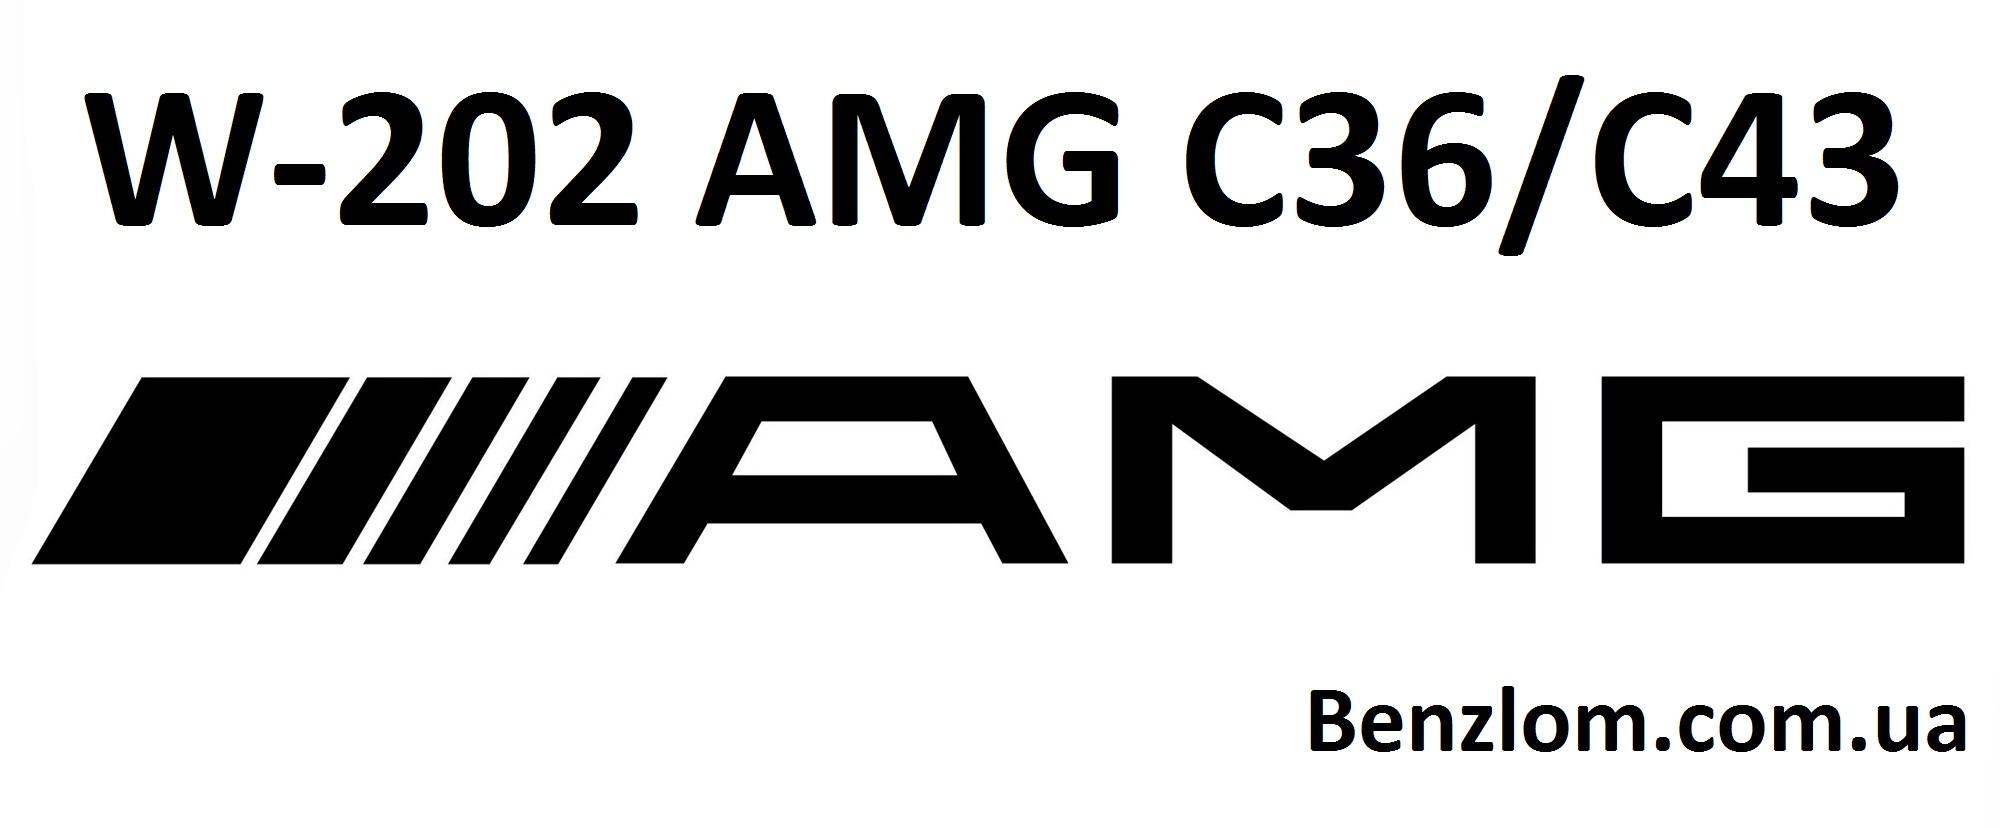 Запчасти MERCEDES W202 AMG C36/C43